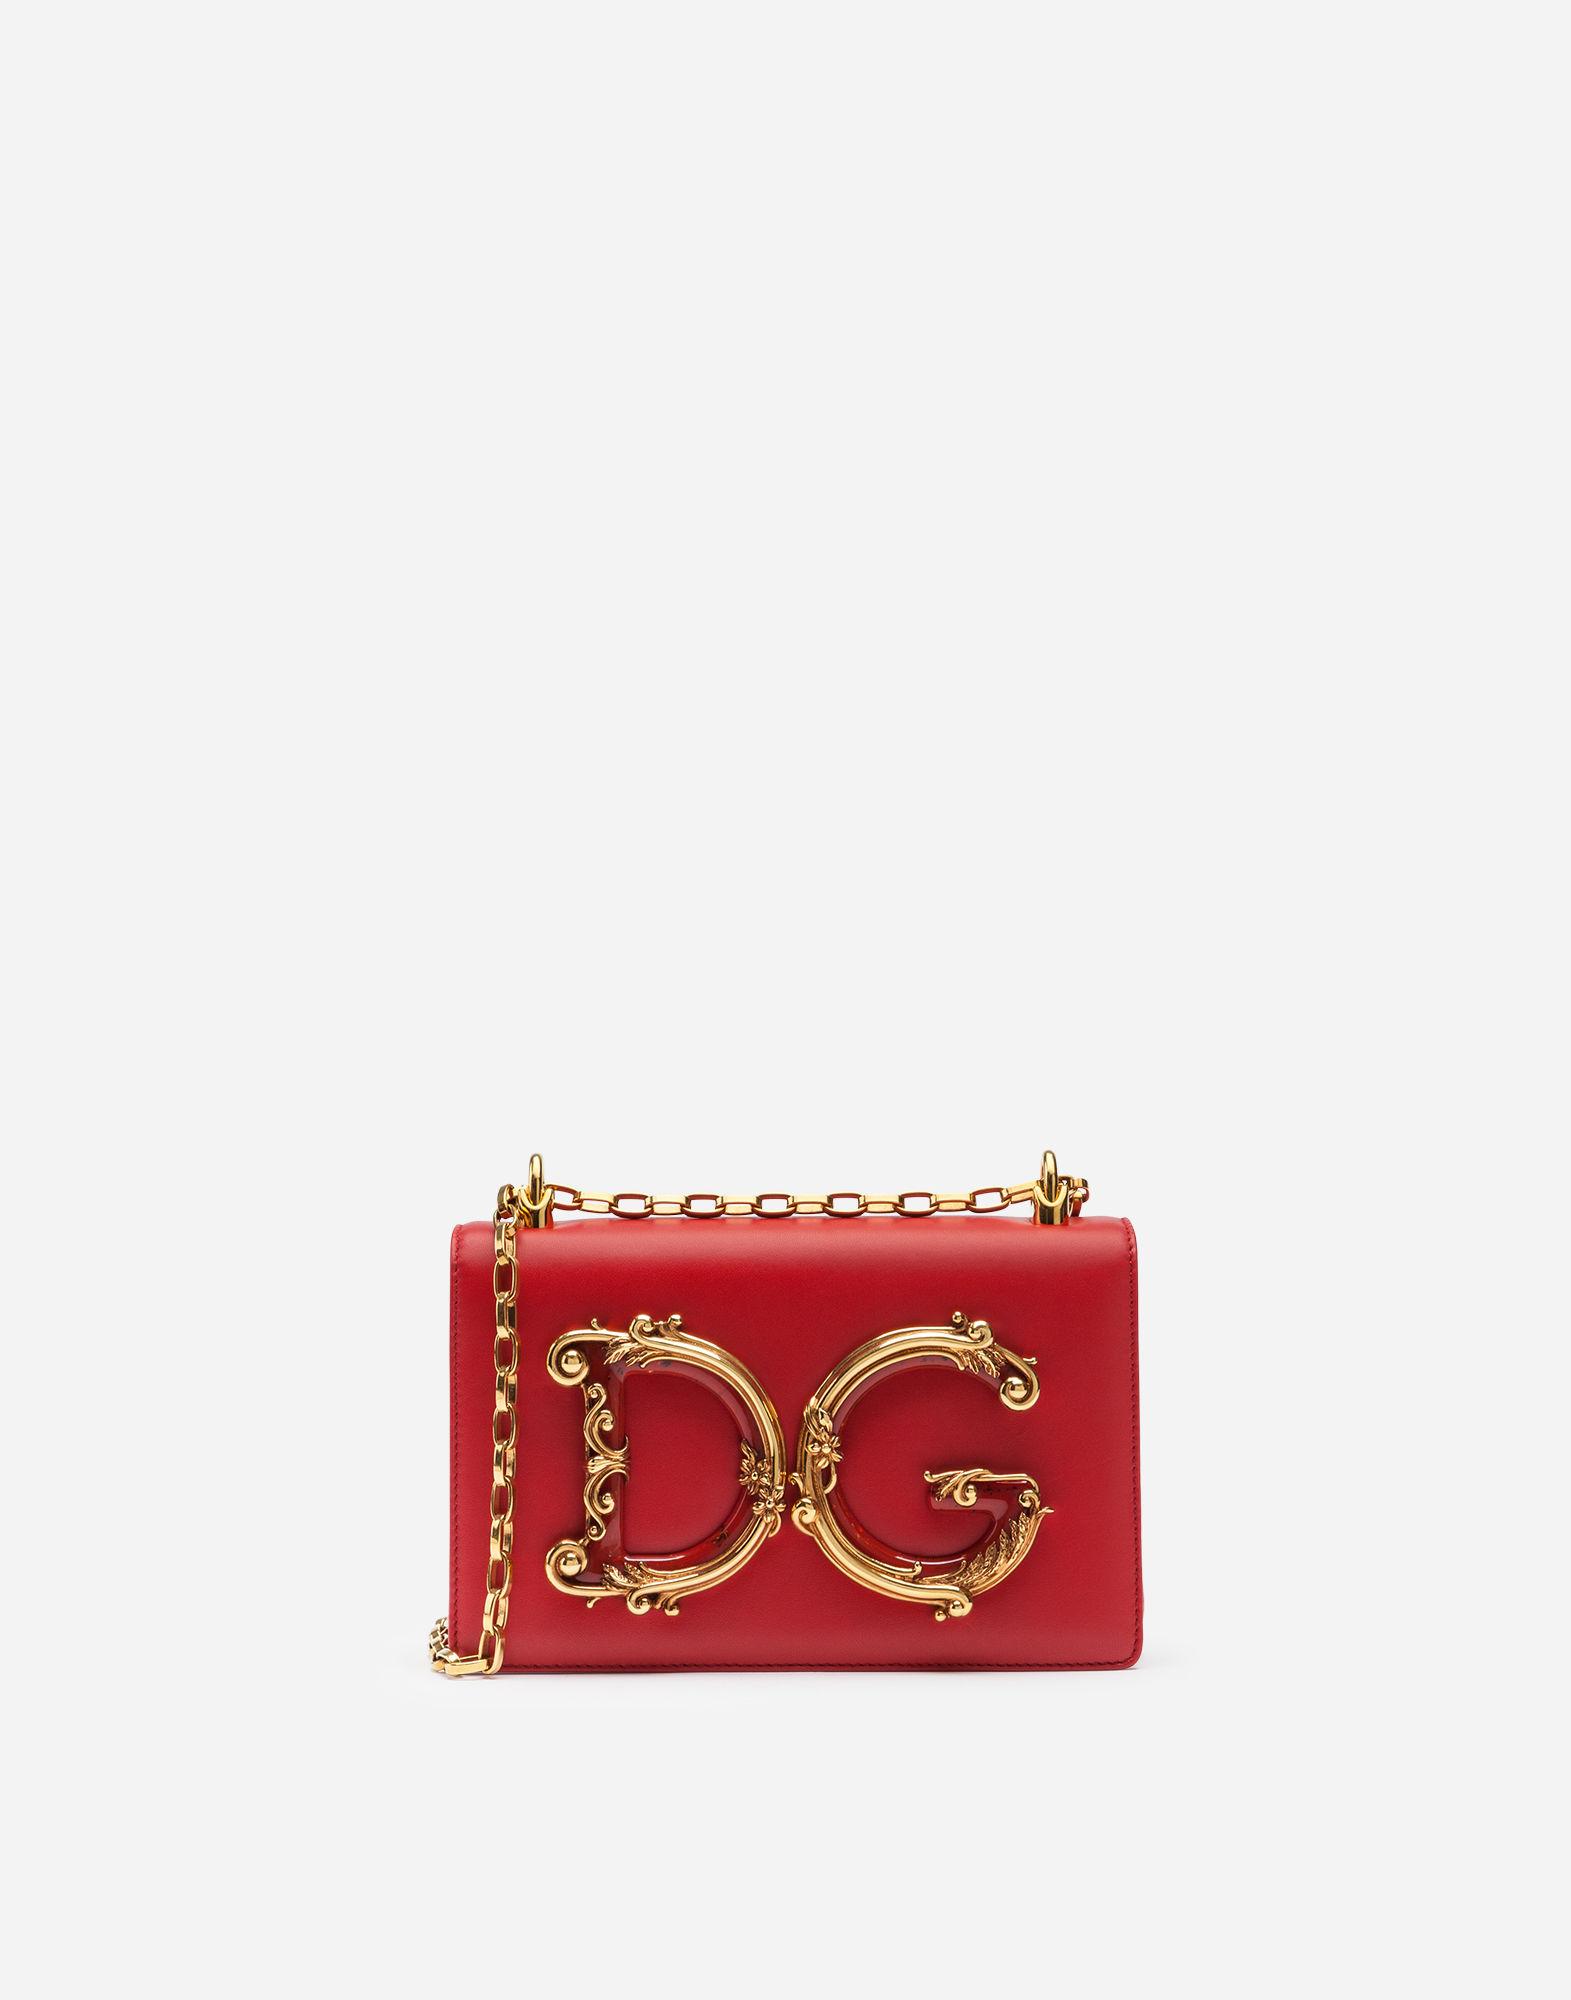 3935e8d628 Dolce   Gabbana Dg Girls Shoulder Bag In Nappa Leather In Red